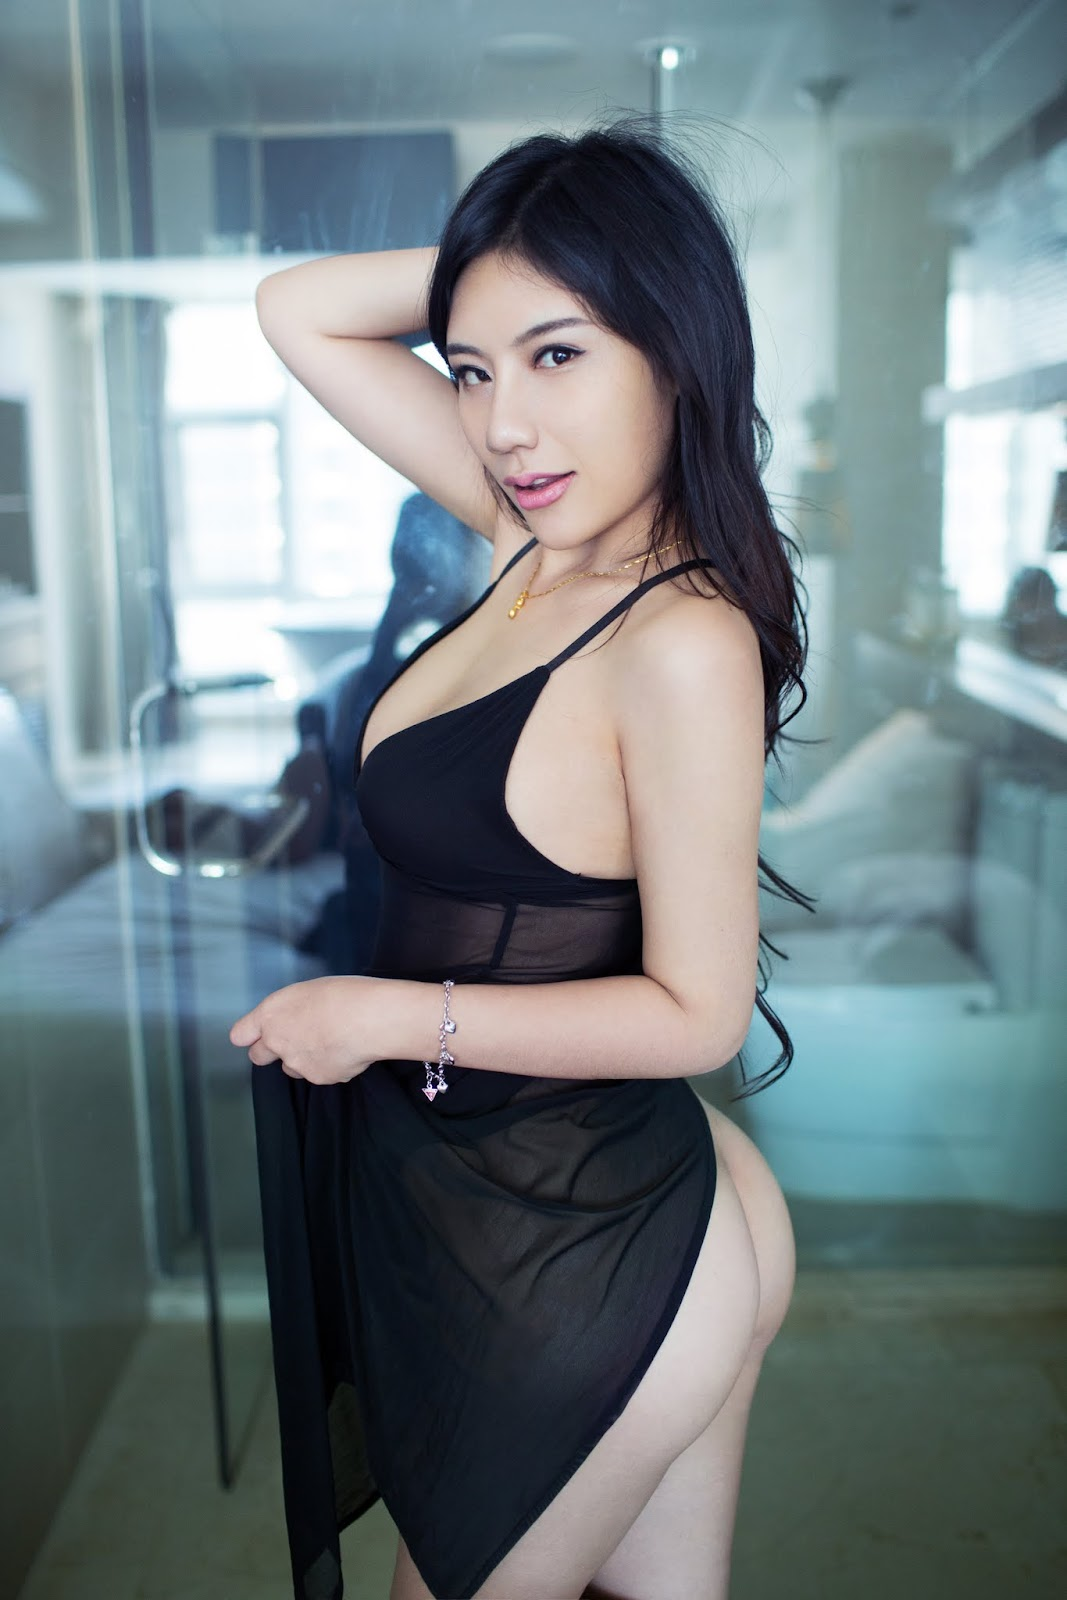 %25C2%25AC%252BO 29 - Hot Sexy Model TUIGIRL NO.46 Nude